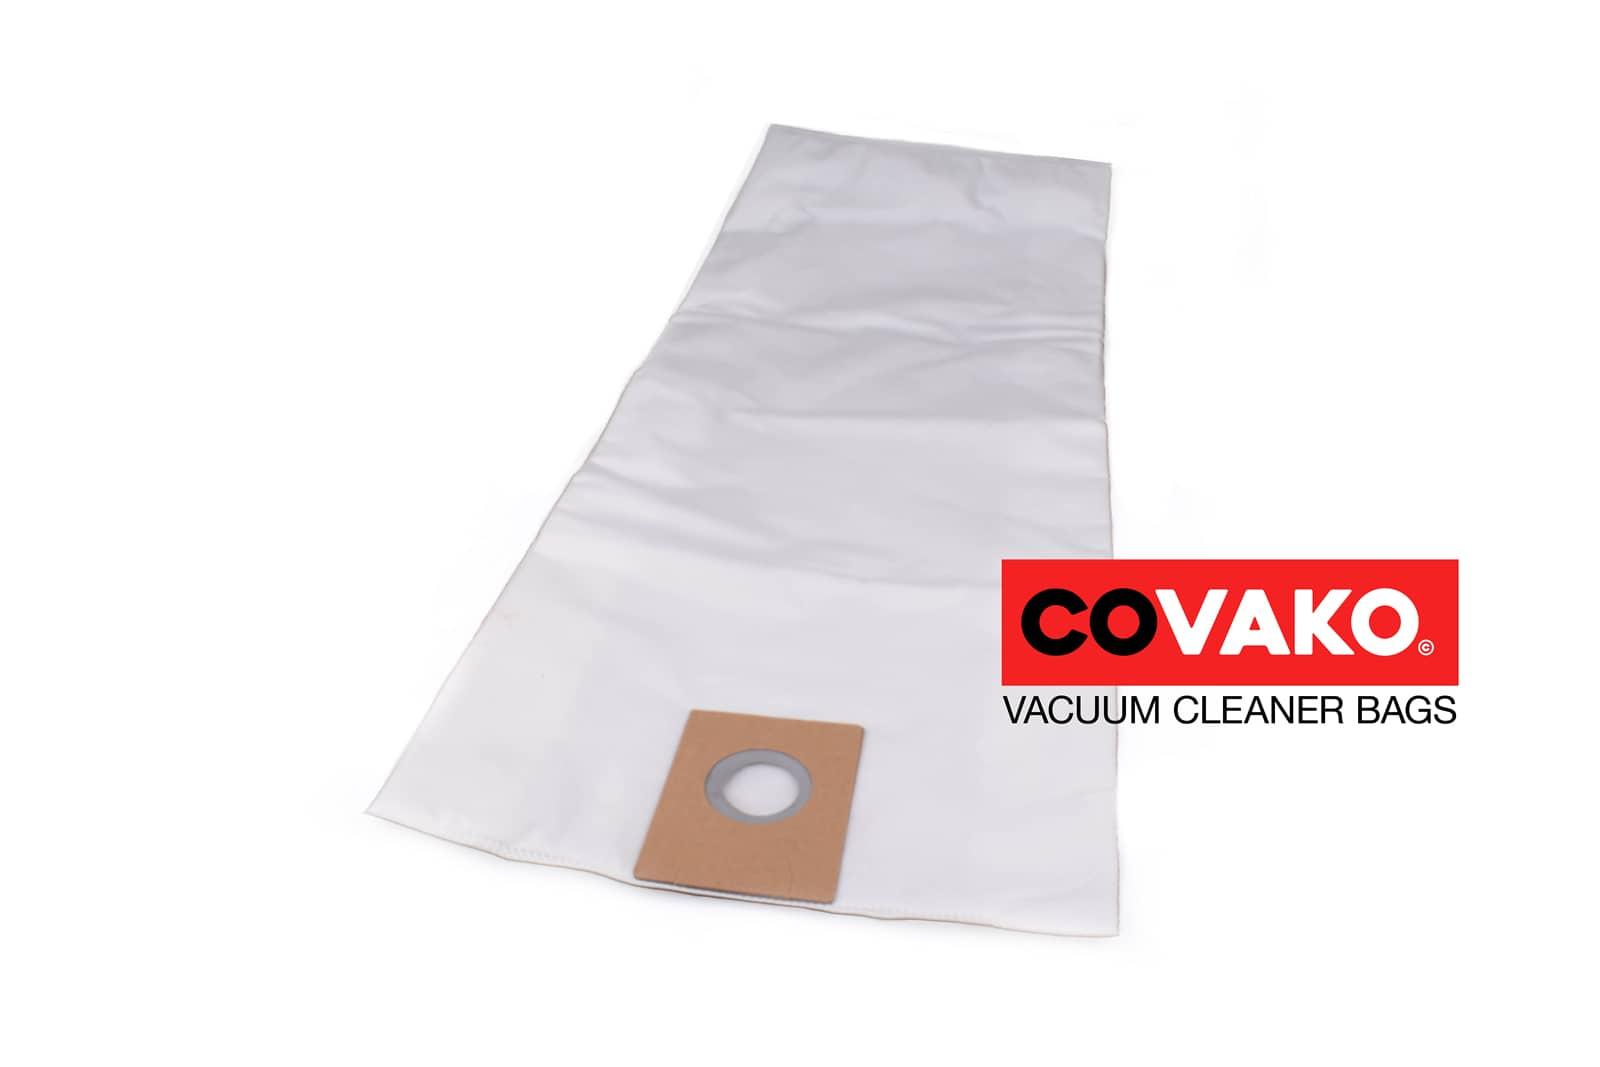 Elsea exel EXWP 125 / Synthétique - Elsea sacs d'aspirateur